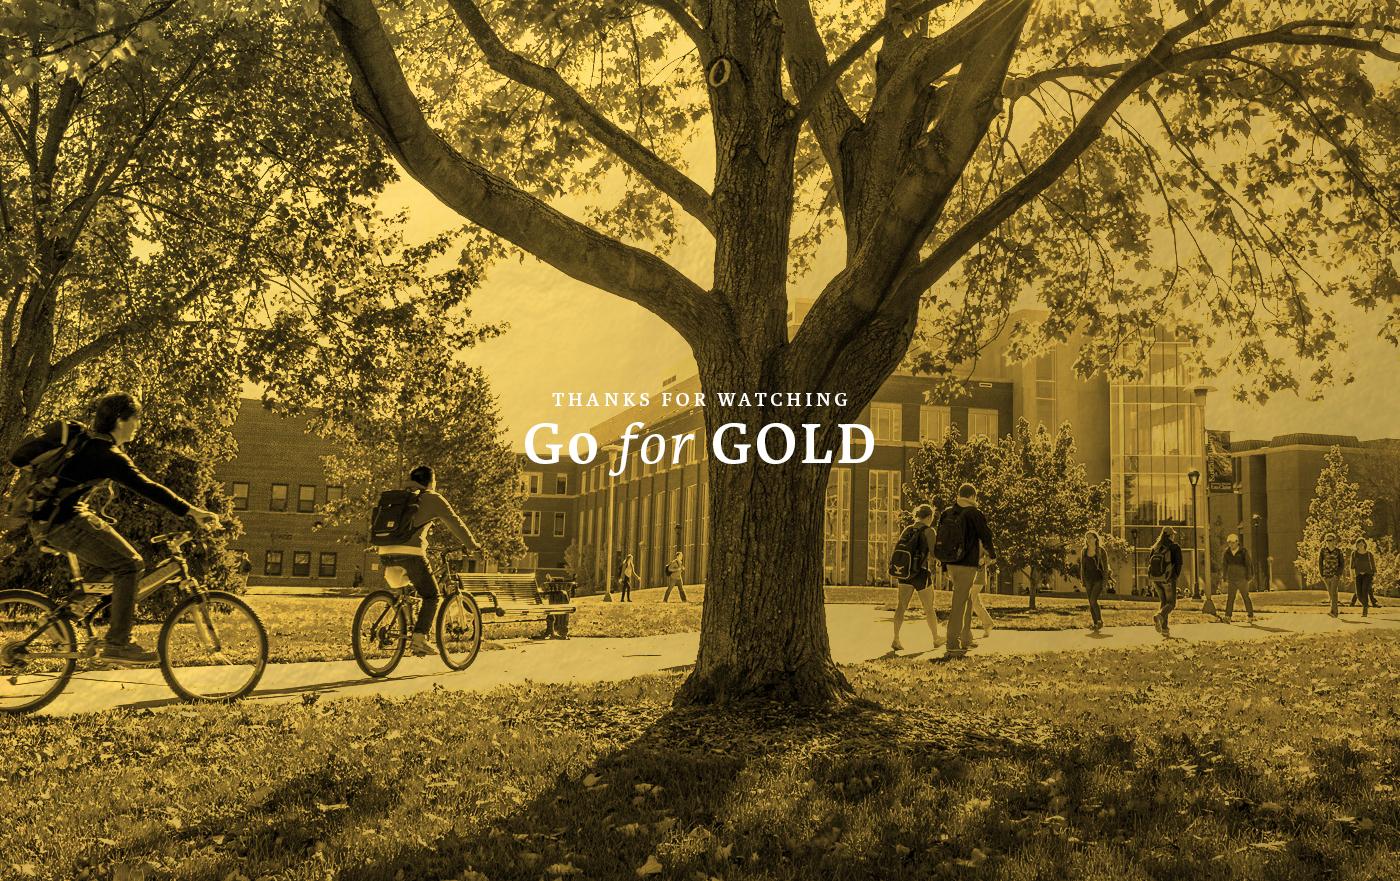 campus creative agency gold elegant classy GoForGold craftmans Students ToTheTop community